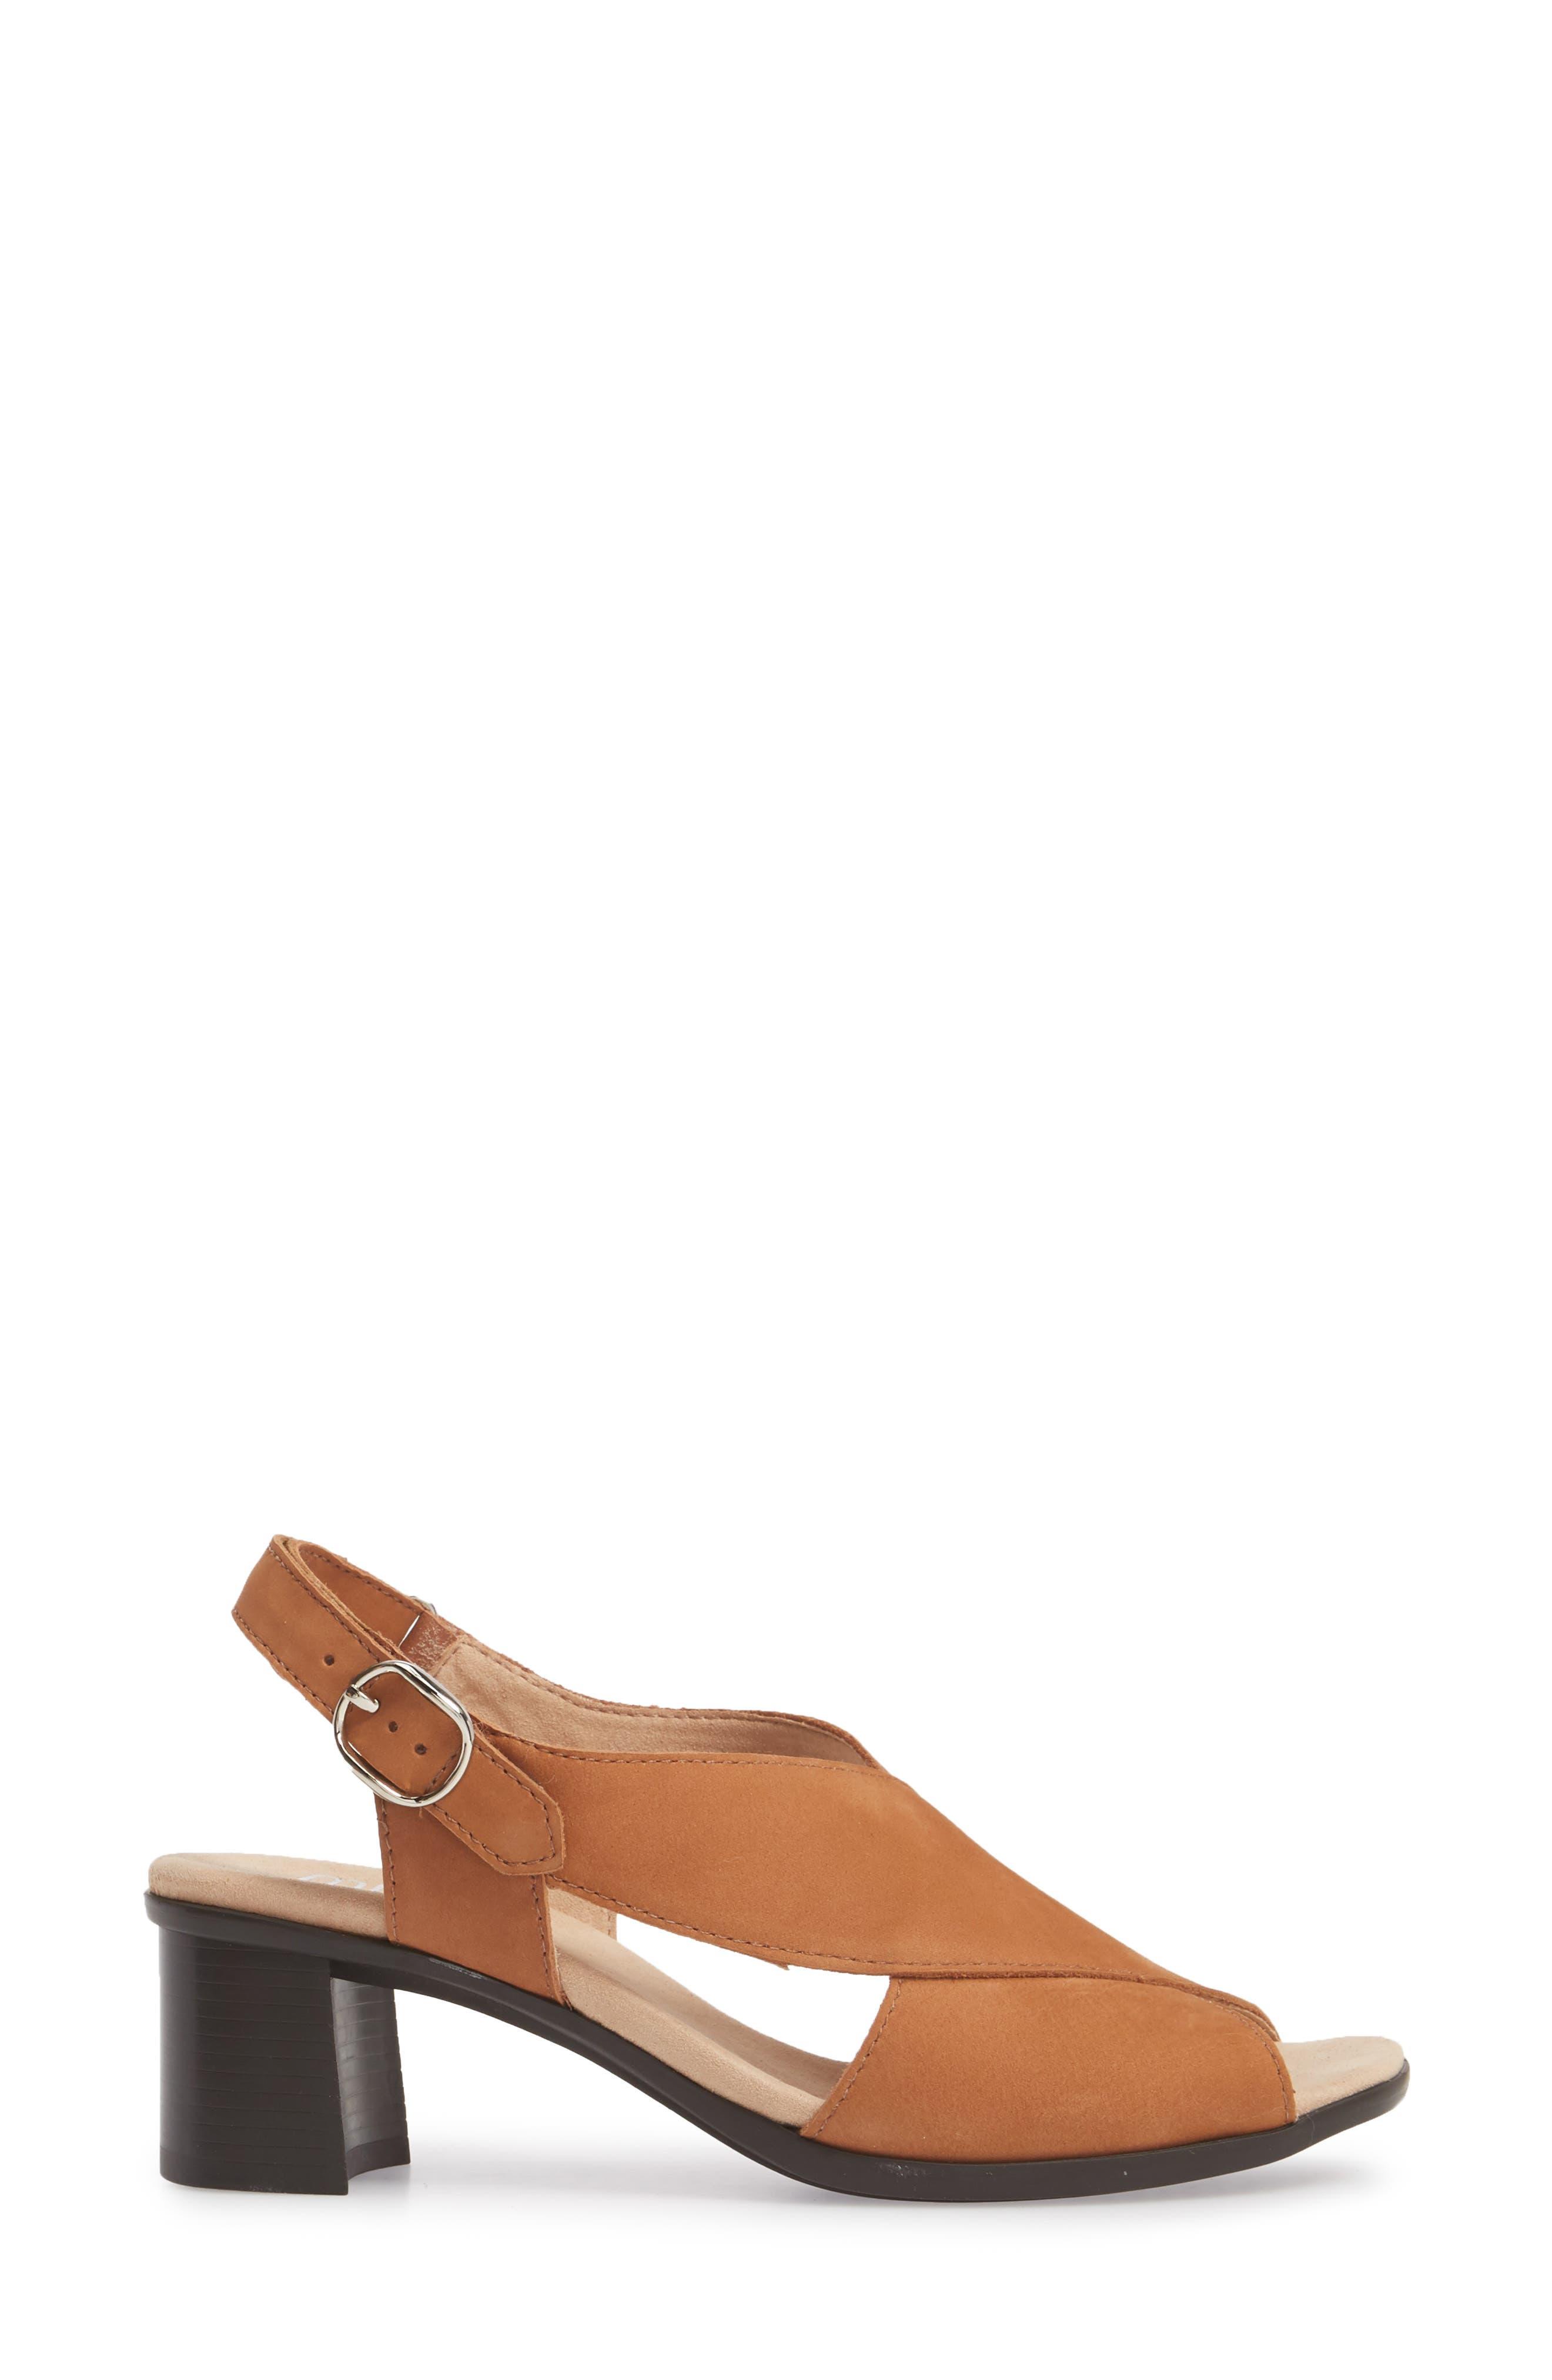 Laine Block Heel Sandal,                             Alternate thumbnail 3, color,                             Brown Nubuck Leather